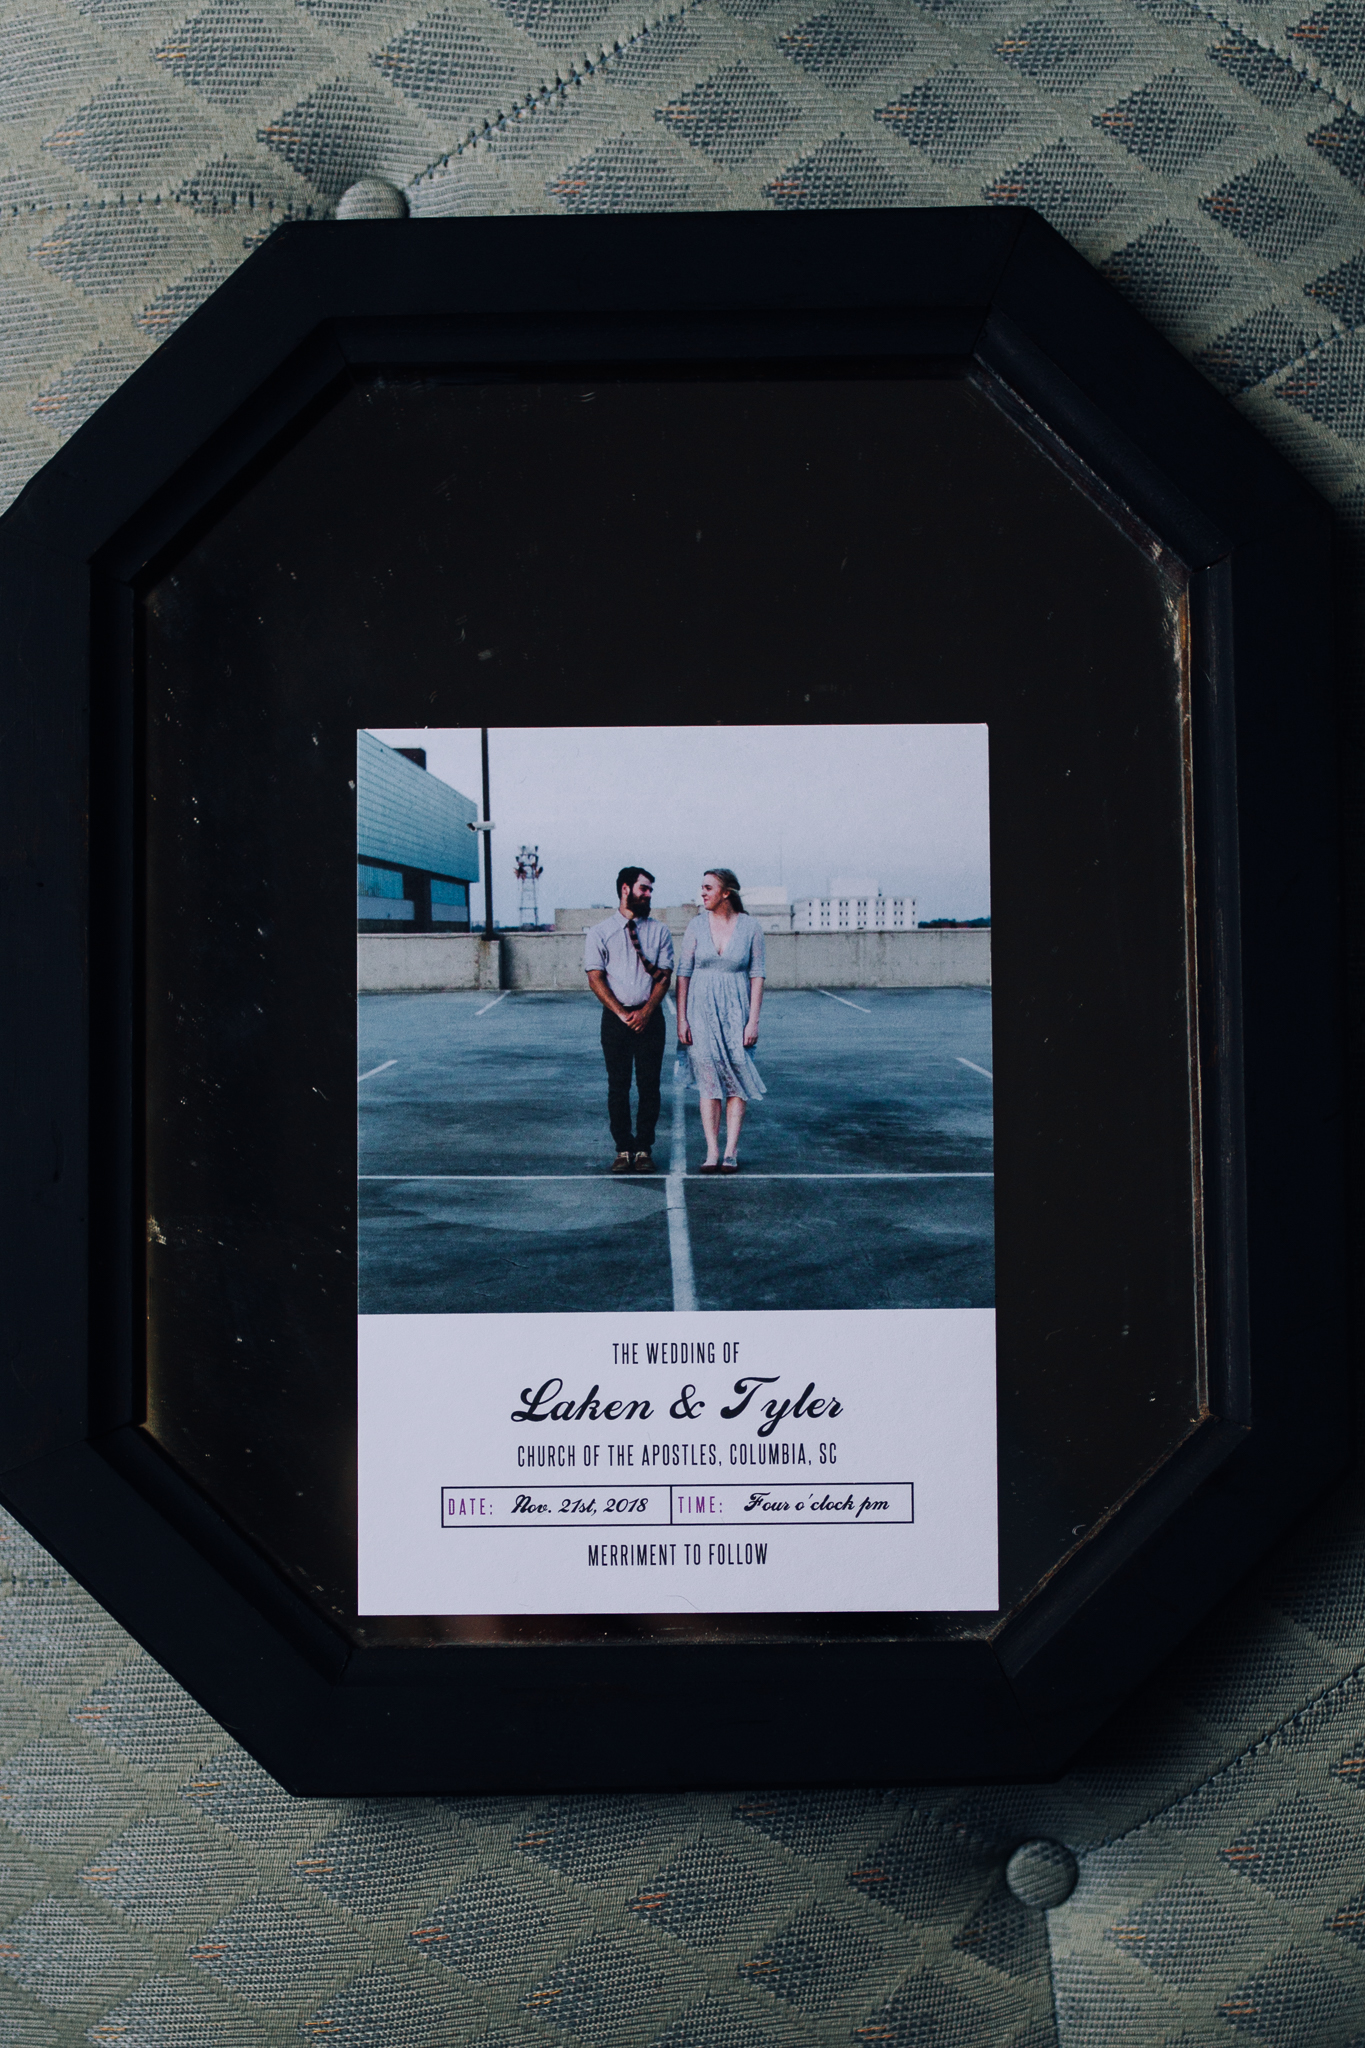 wedding invitations paper details basic invite blog-7.jpg